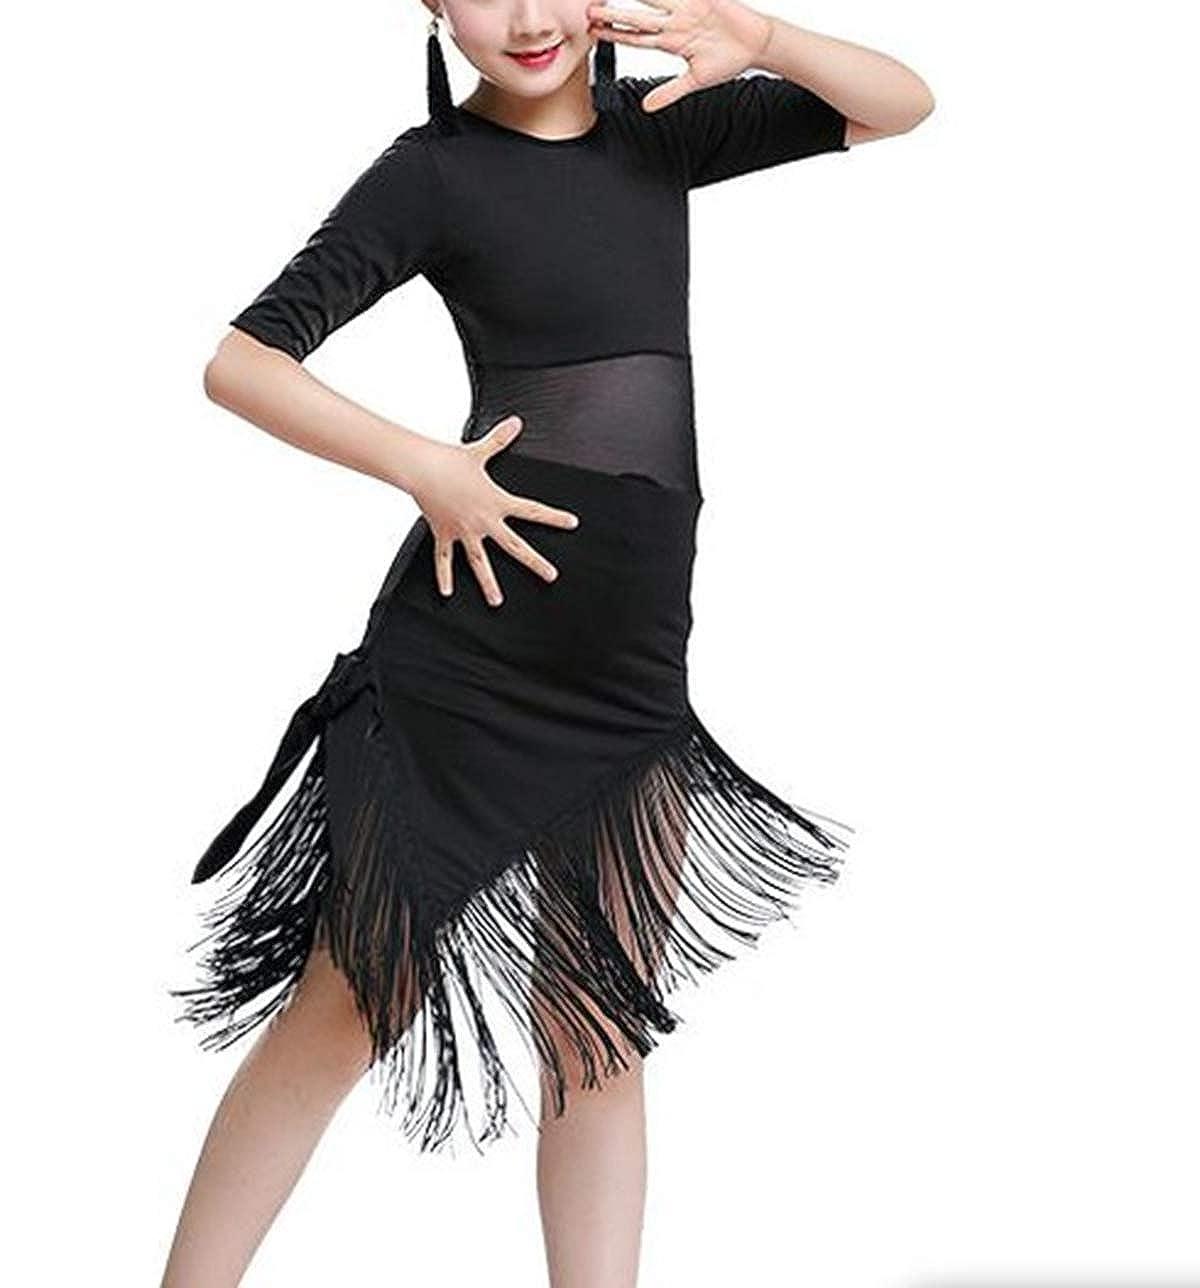 Amazon.com: dPois Girls Latin Rumba Stage Performance ...